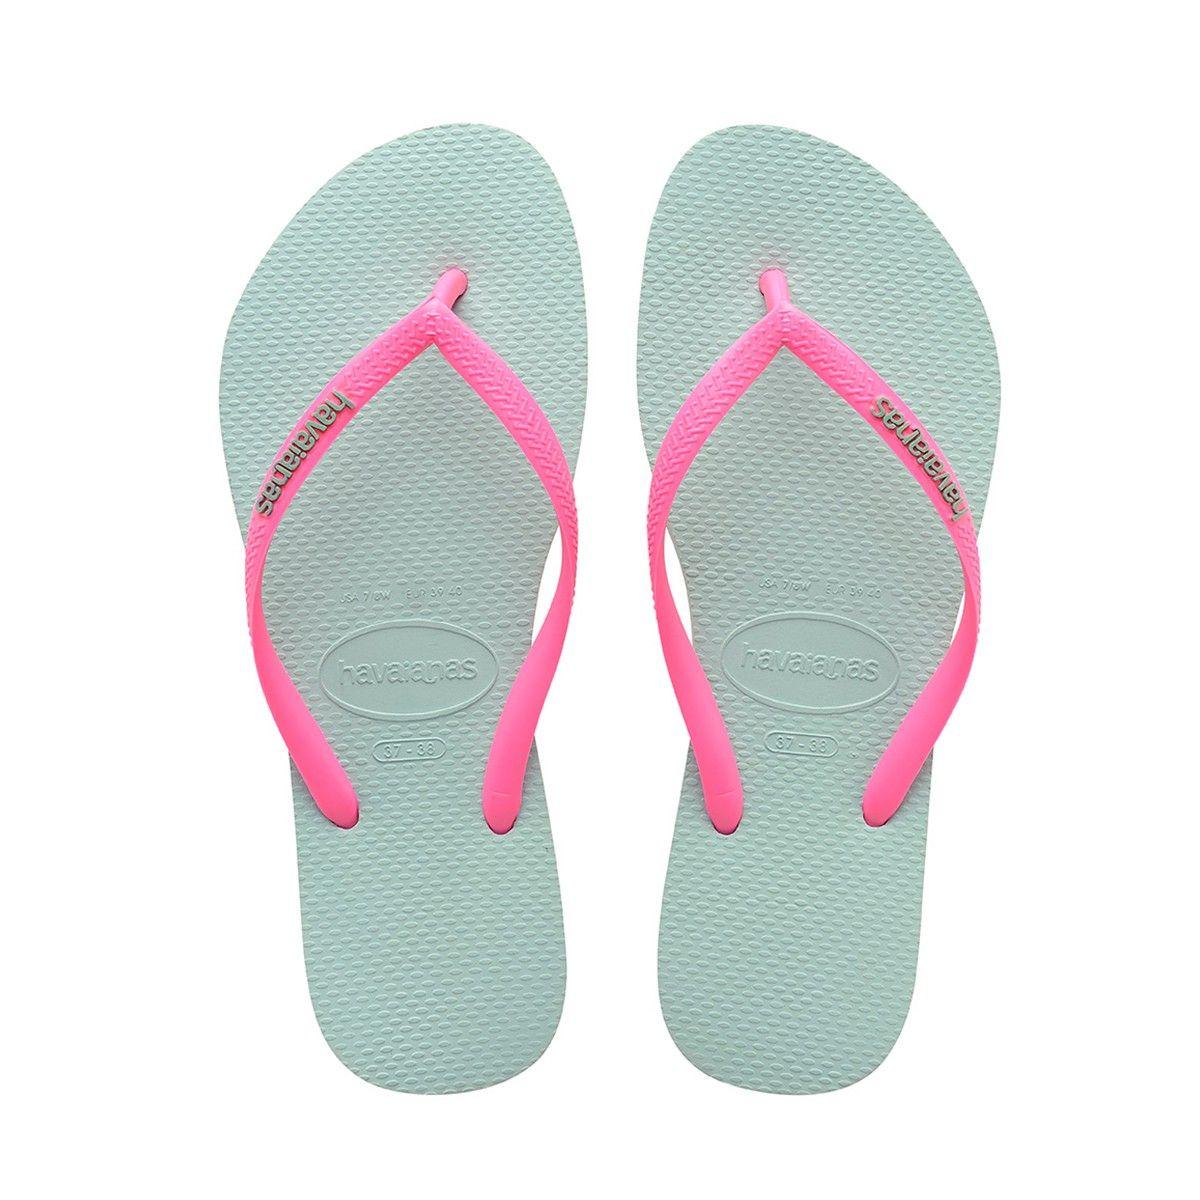 564bc6f0c HAVAIANAS SLIM LOGO POP UP SANDAL MENTHA GREEN.  havaianas  shoes  all